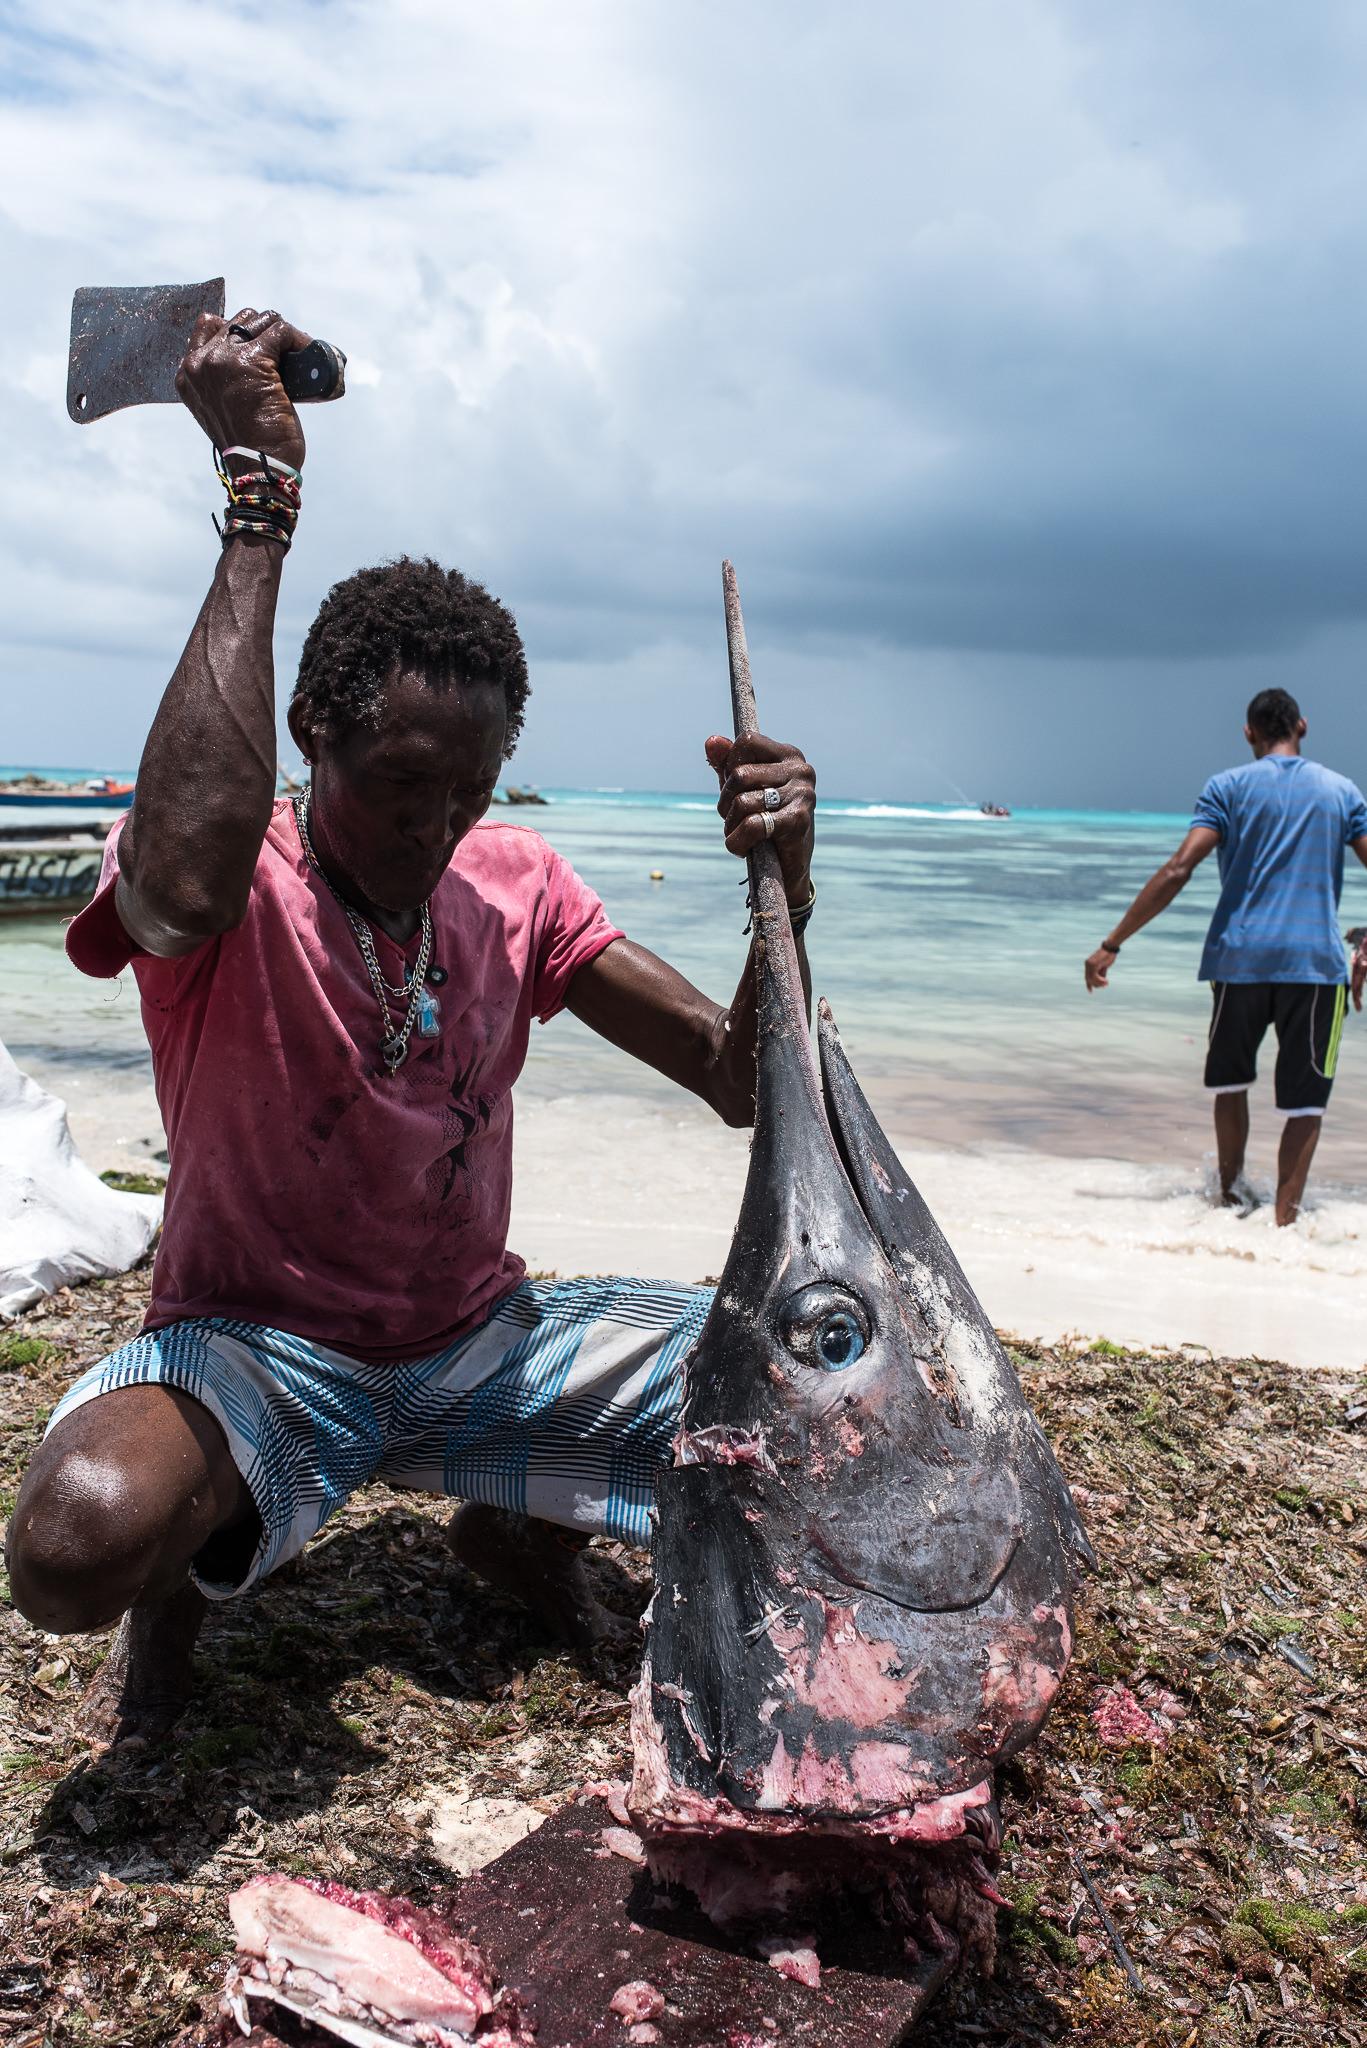 barco_sai_sanandres_colombia_caribe_fisherman_haya_sky_blue_isla_island_00013.jpg